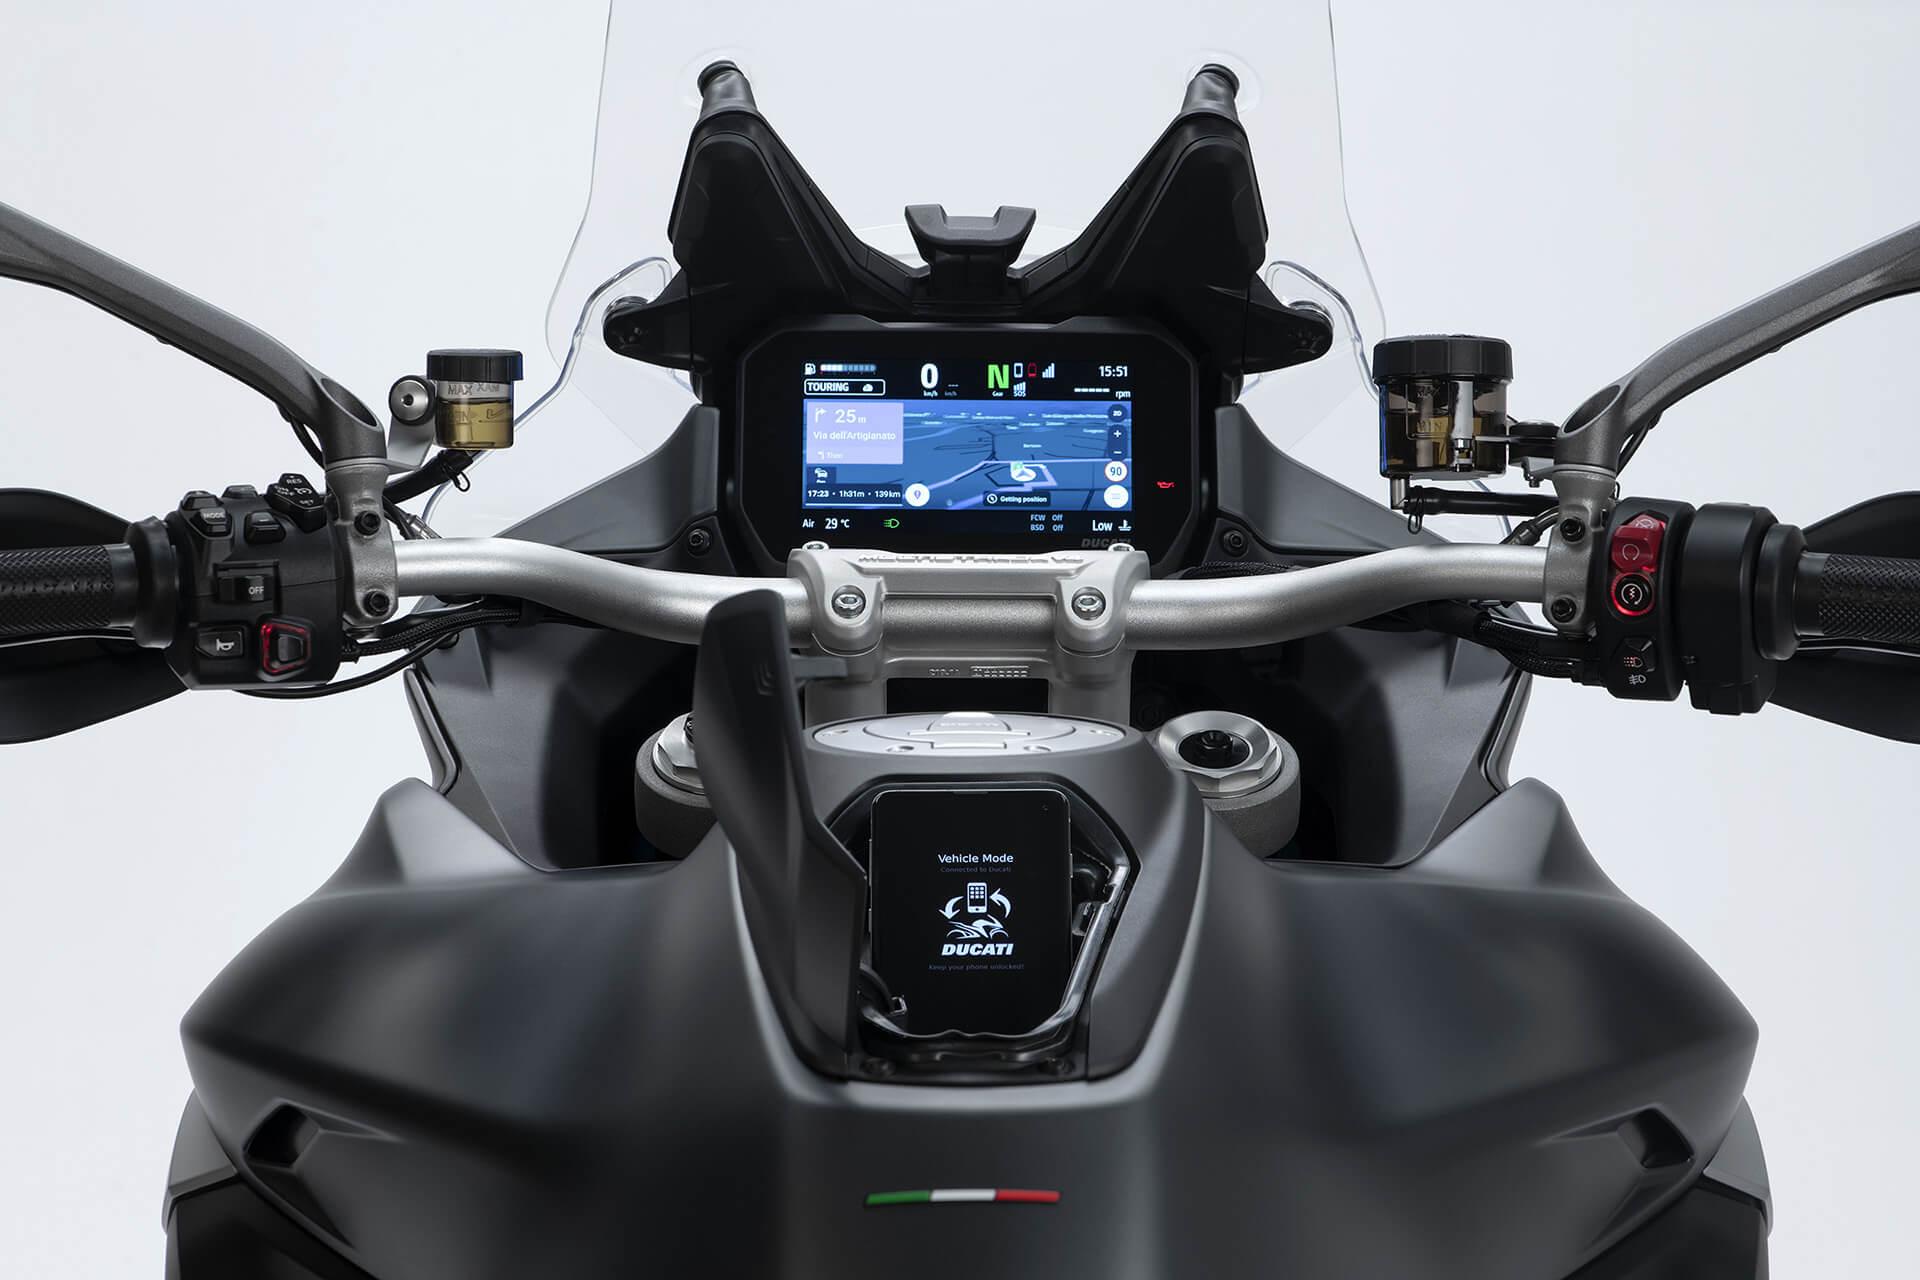 Ducati Multistrada V4 S dashboard